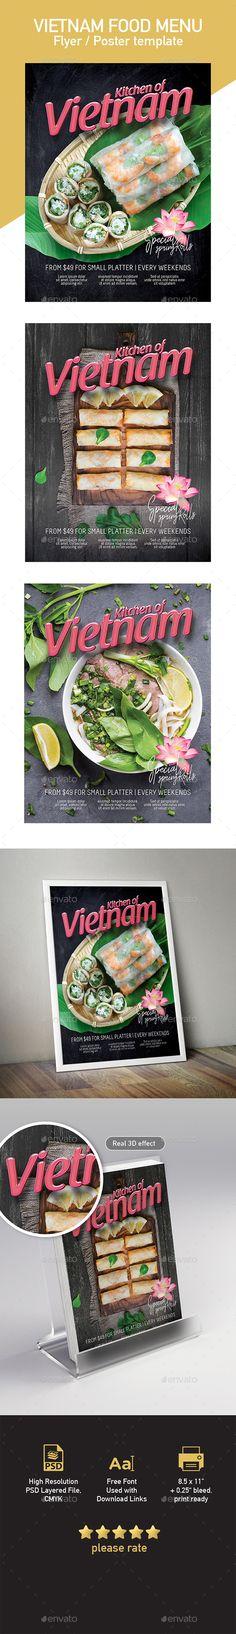 Template of Vietnamese Food Restaurant Menu — Photoshop PSD #vietnamese #Vietnam menu • Download ➝ https://graphicriver.net/item/template-of-vietnamese-food-restaurant-menu/20041194?ref=pxcr